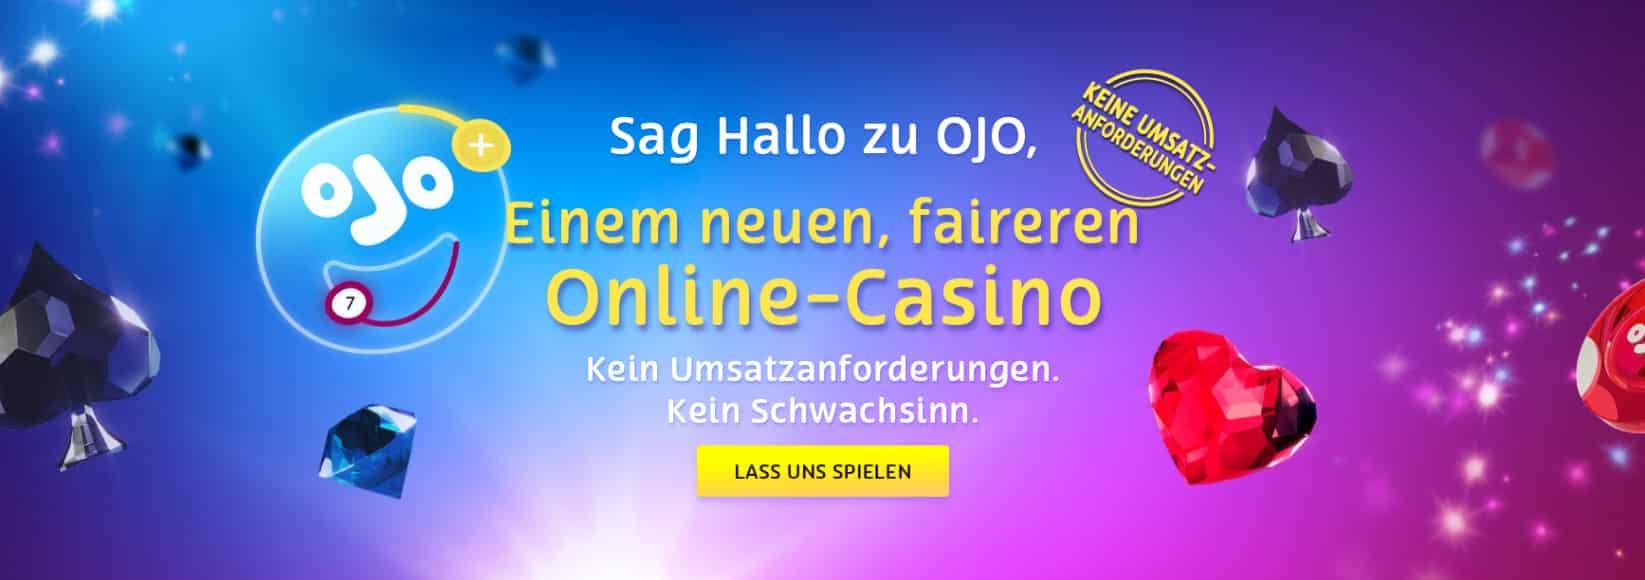 PlayOJO Casino Content Images - Germany CasinoTop 05